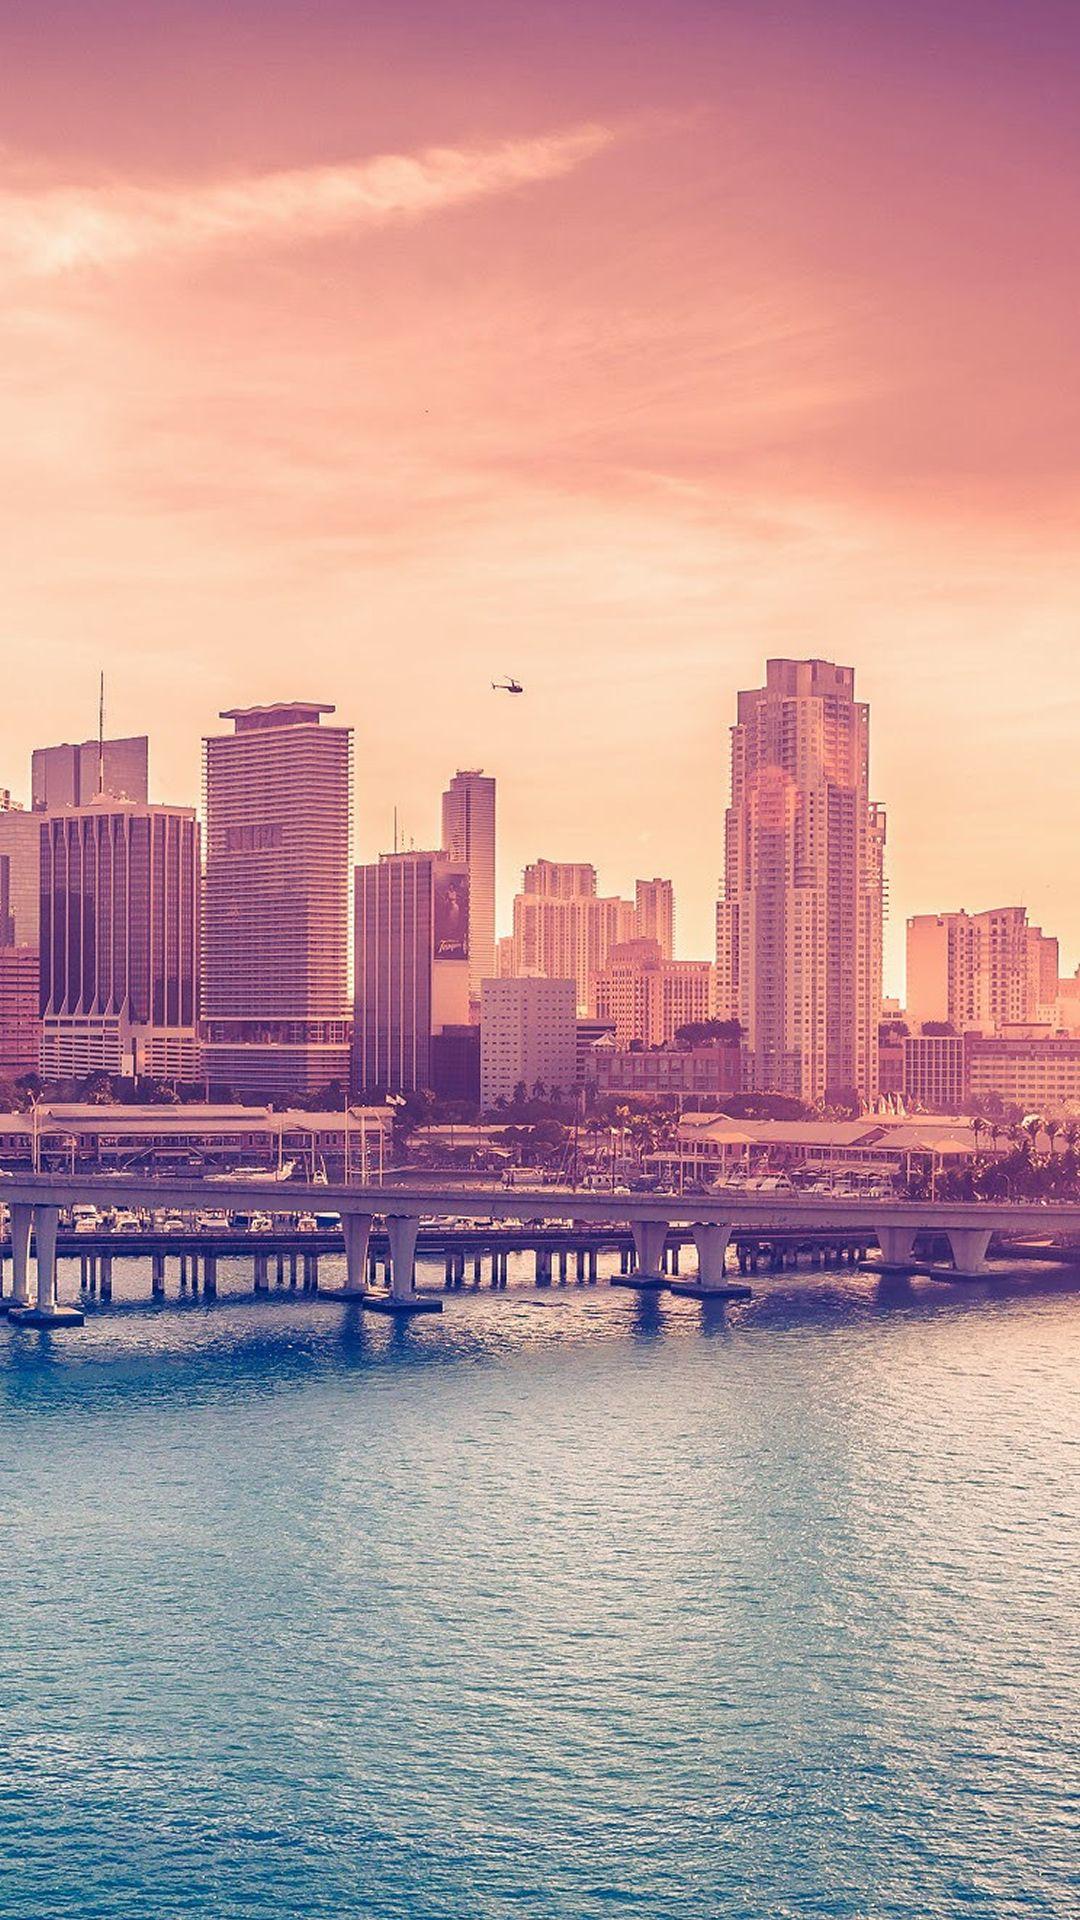 City Skyline Bridge Sunset Ios8 Iphone 6 Plus Wallpaper Sunset Wallpaper City Wallpaper Wallpaper Keren